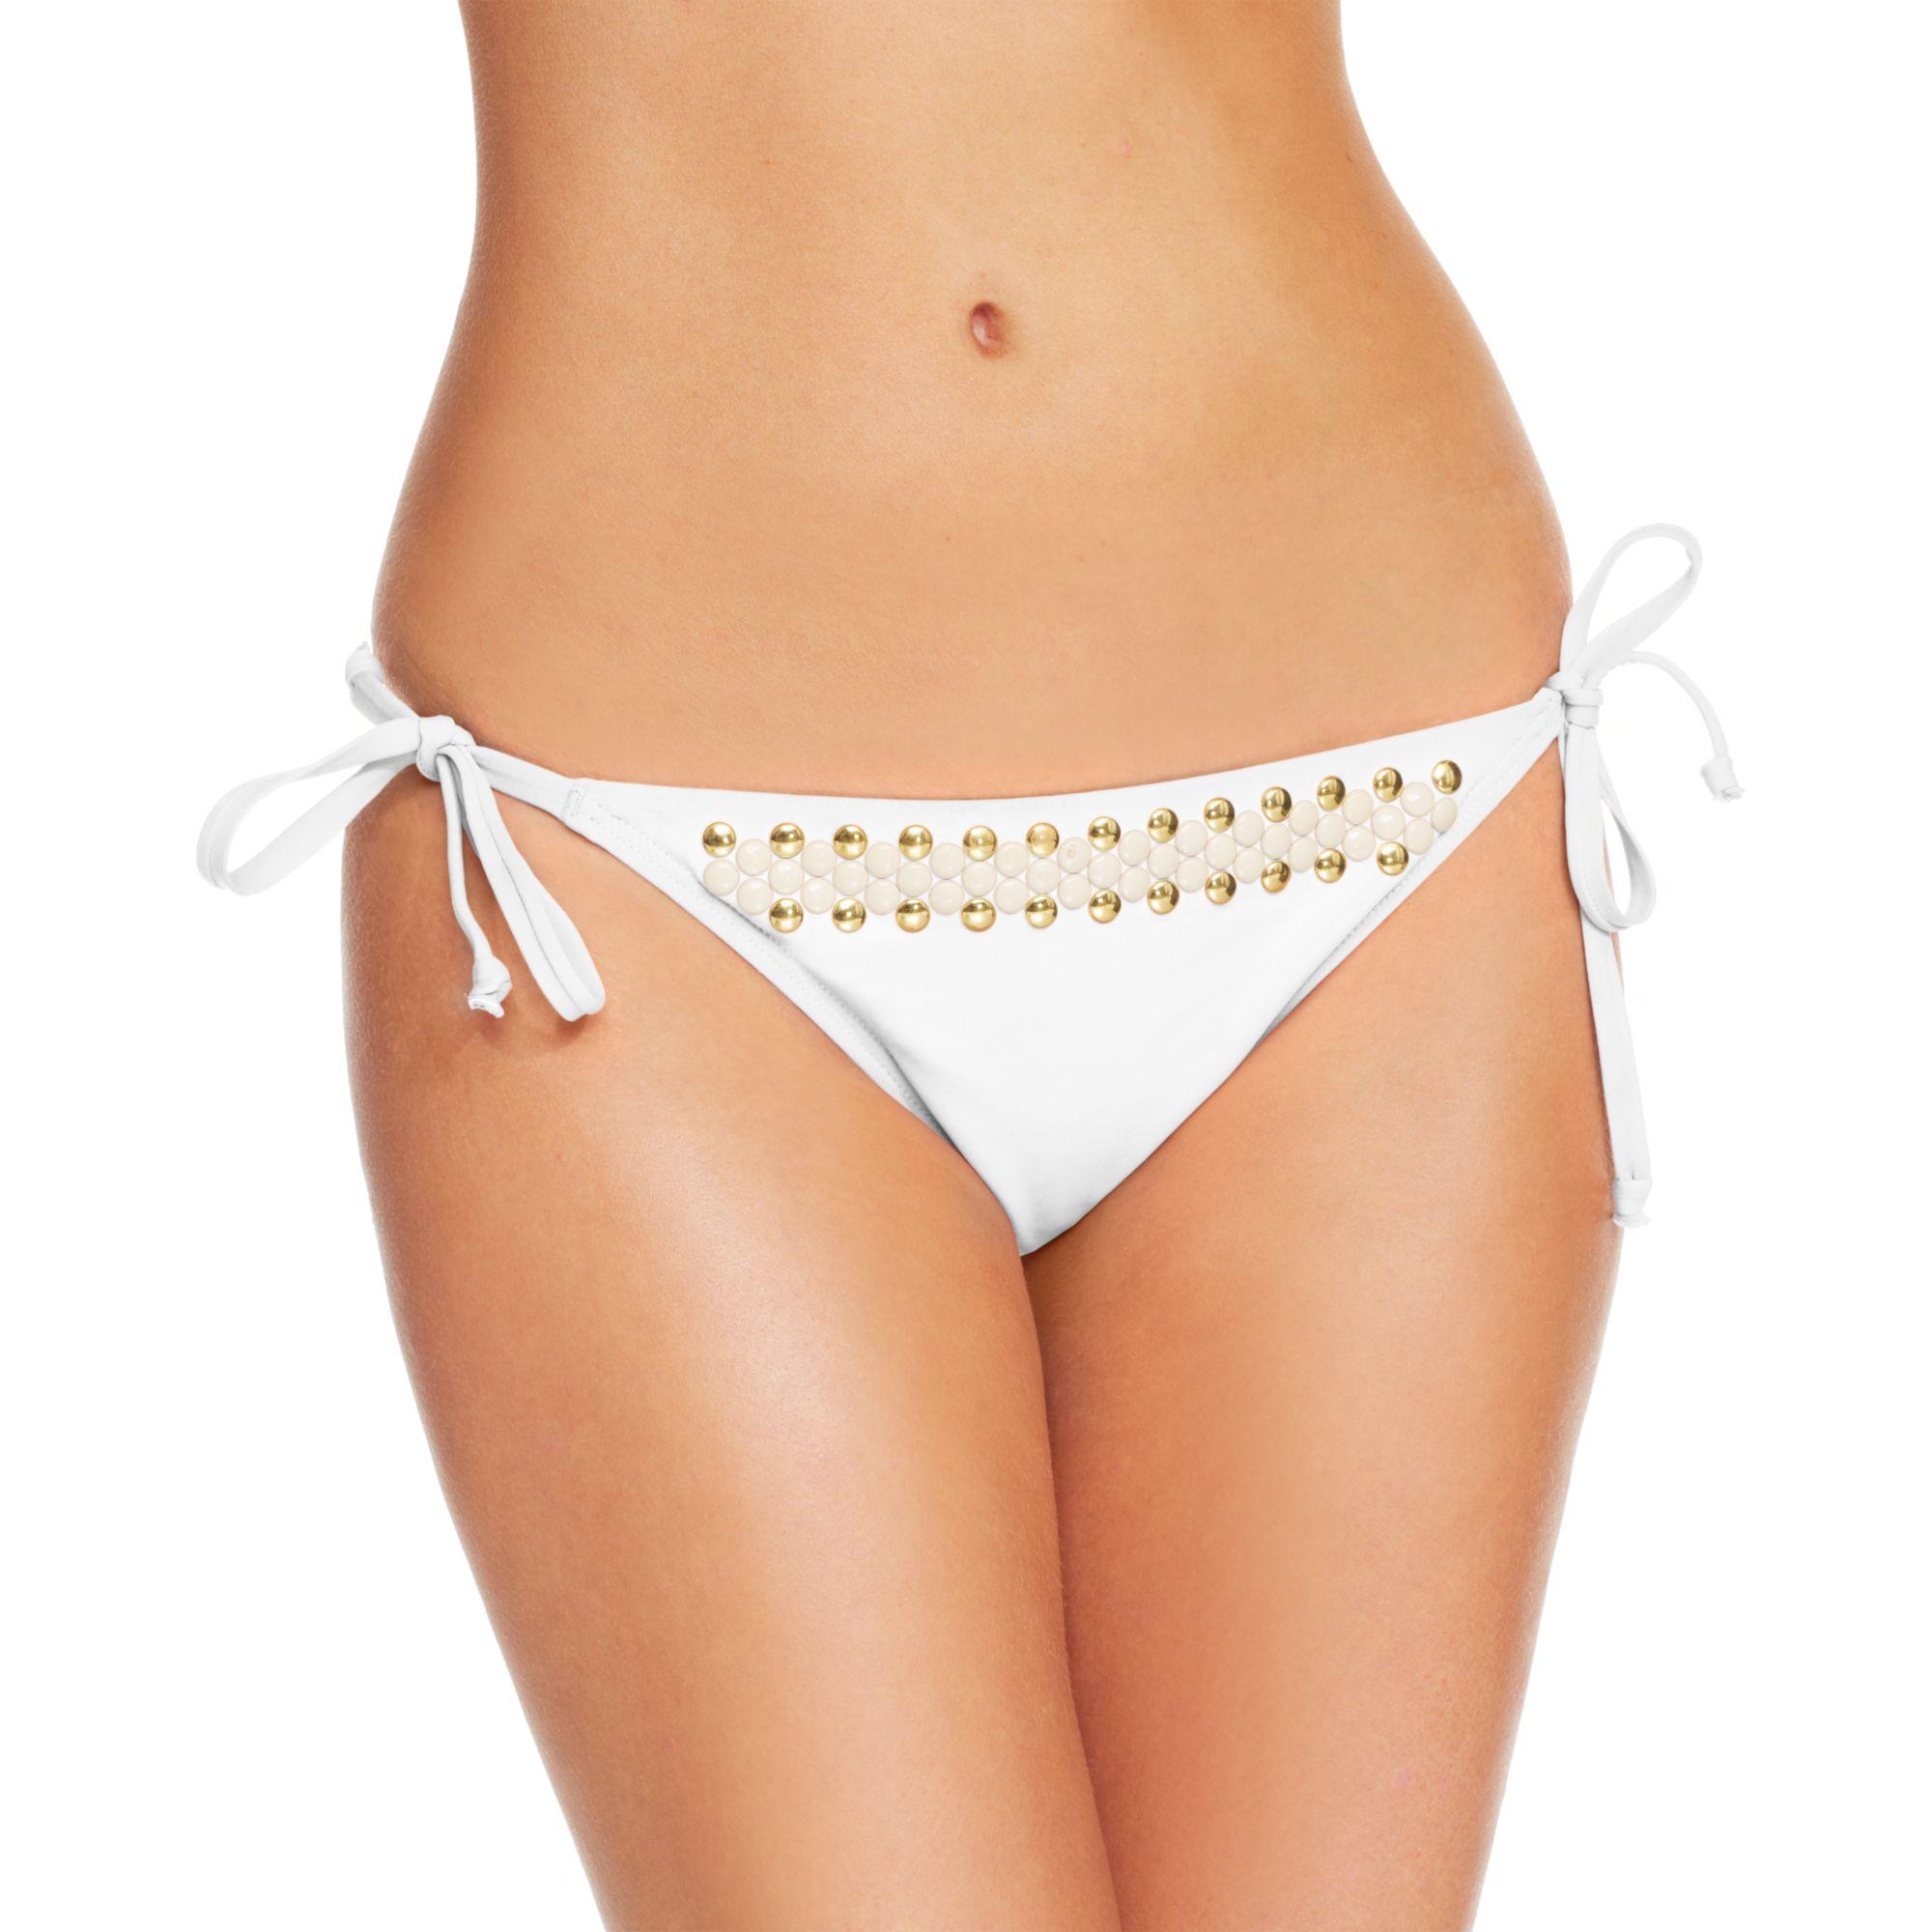 Michael michael kors studded bikini